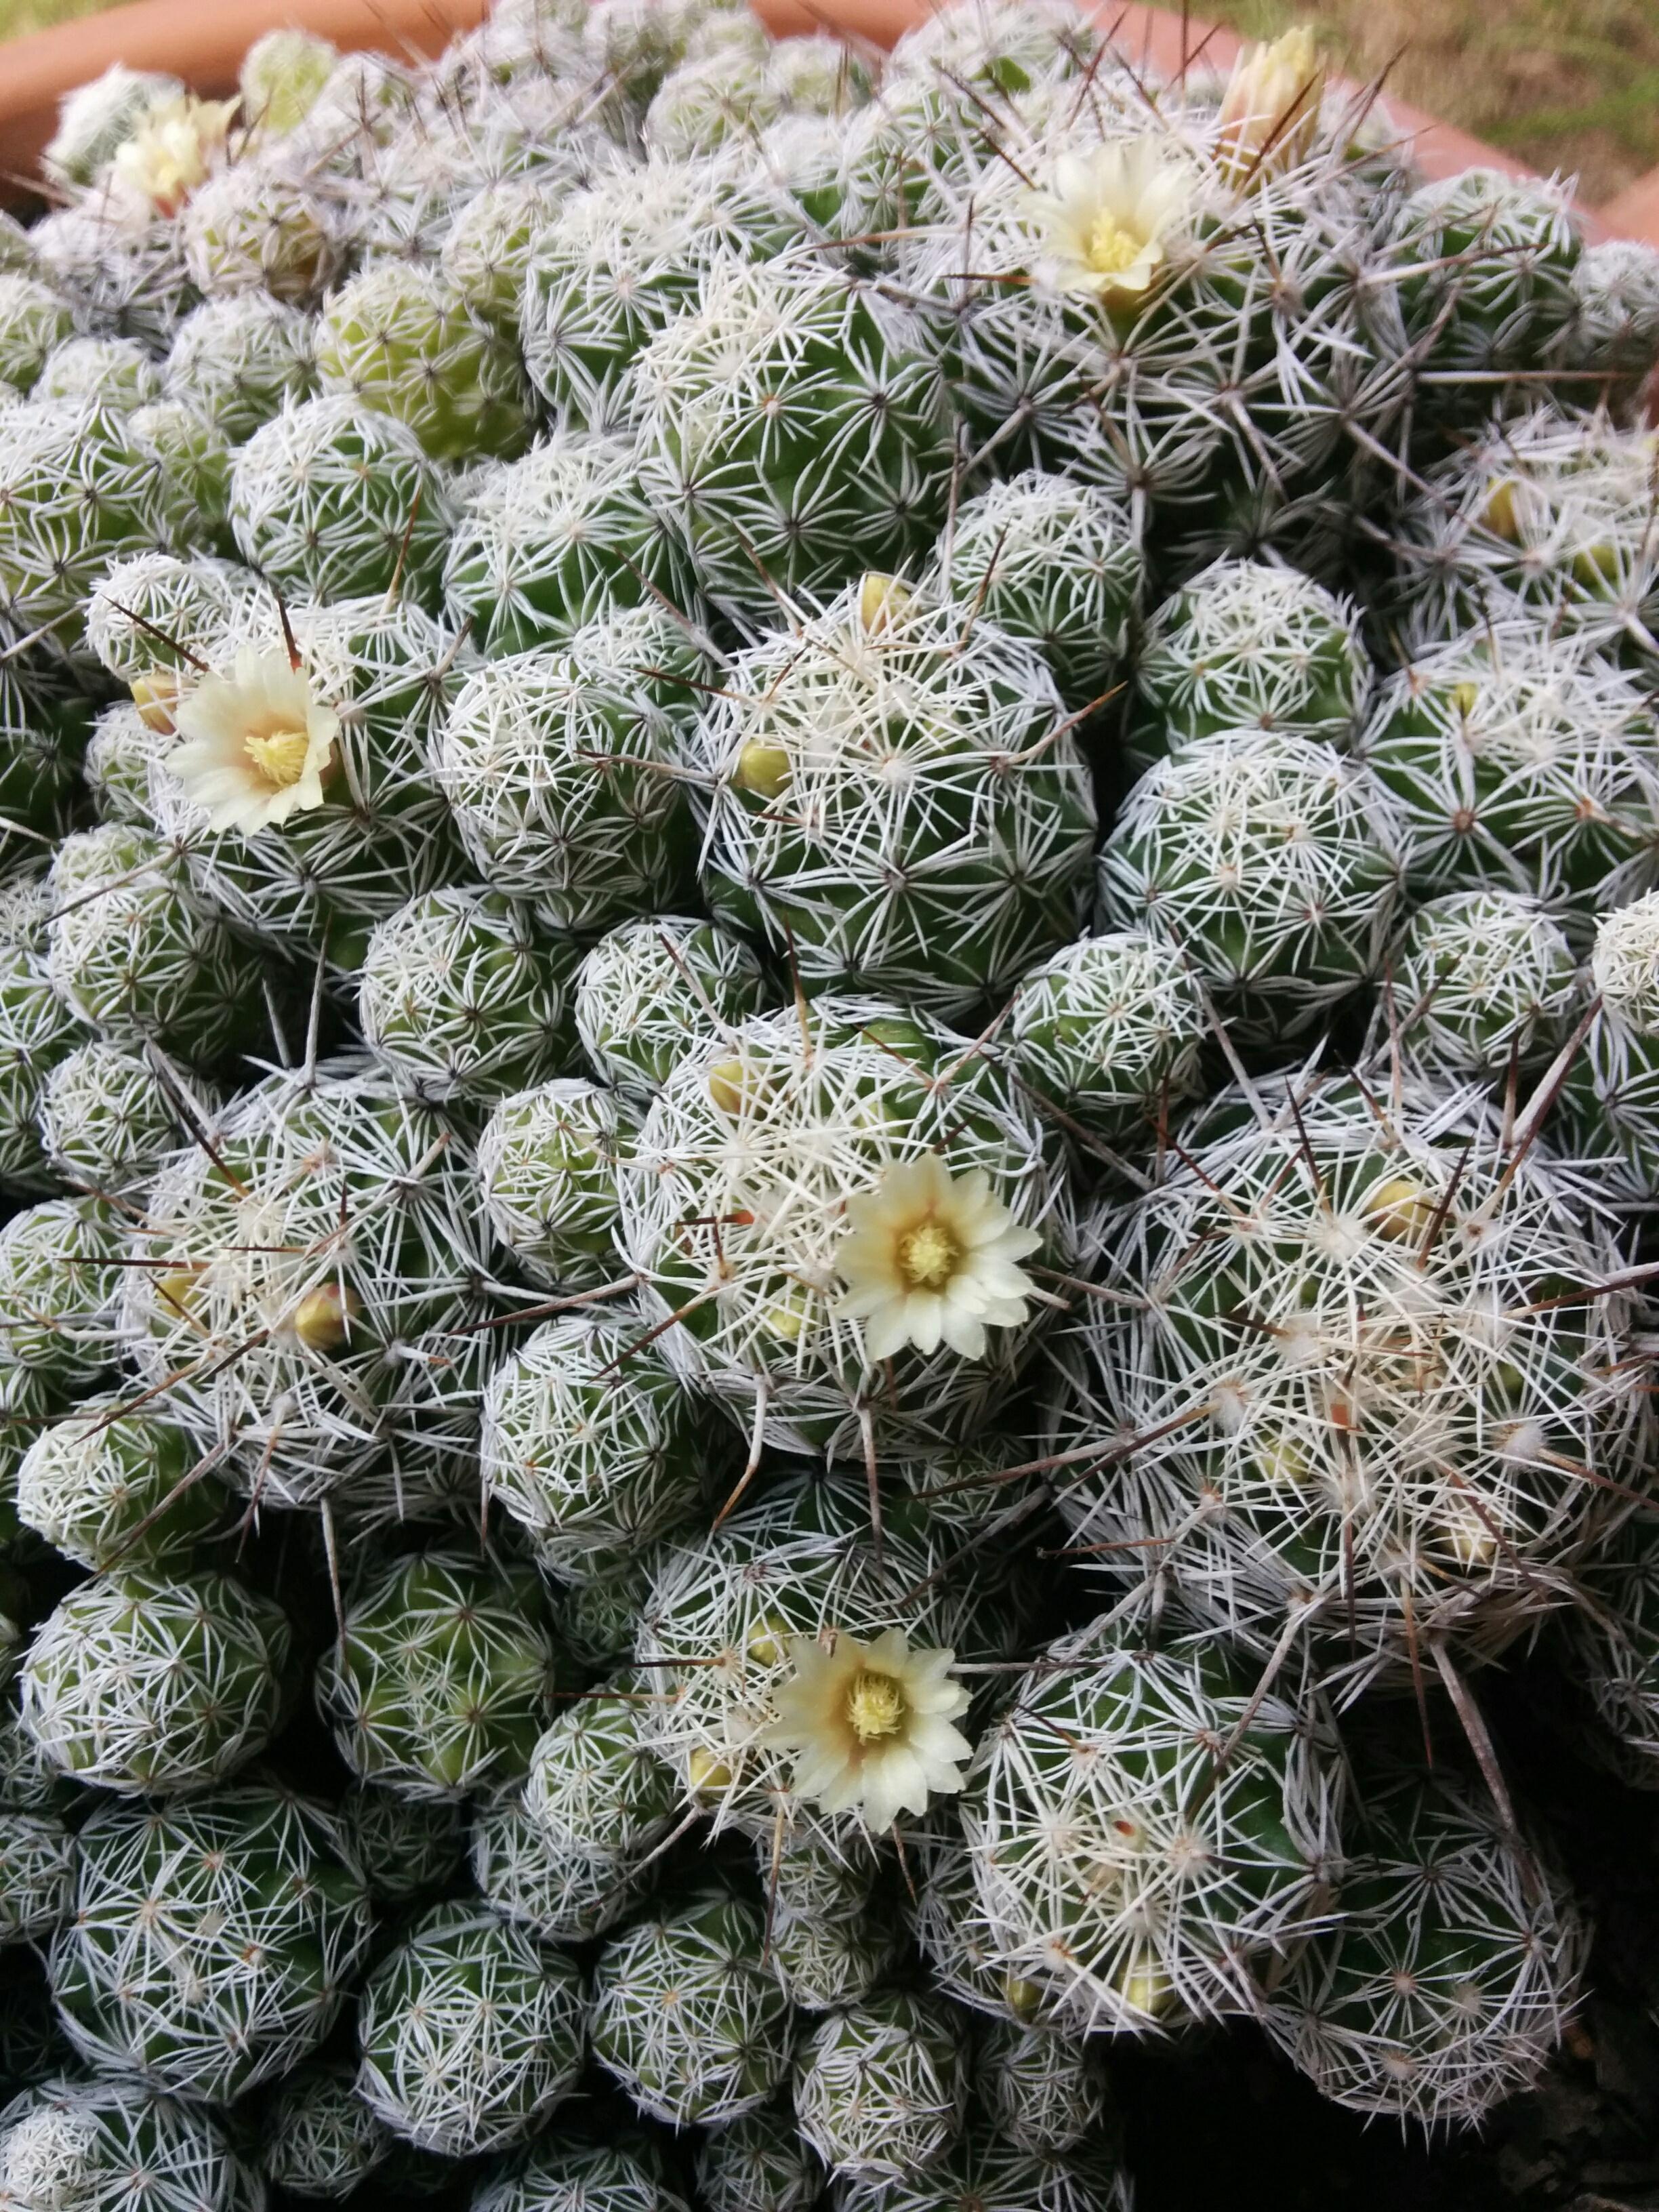 IMG_20160427_125016-Jackie's cactus